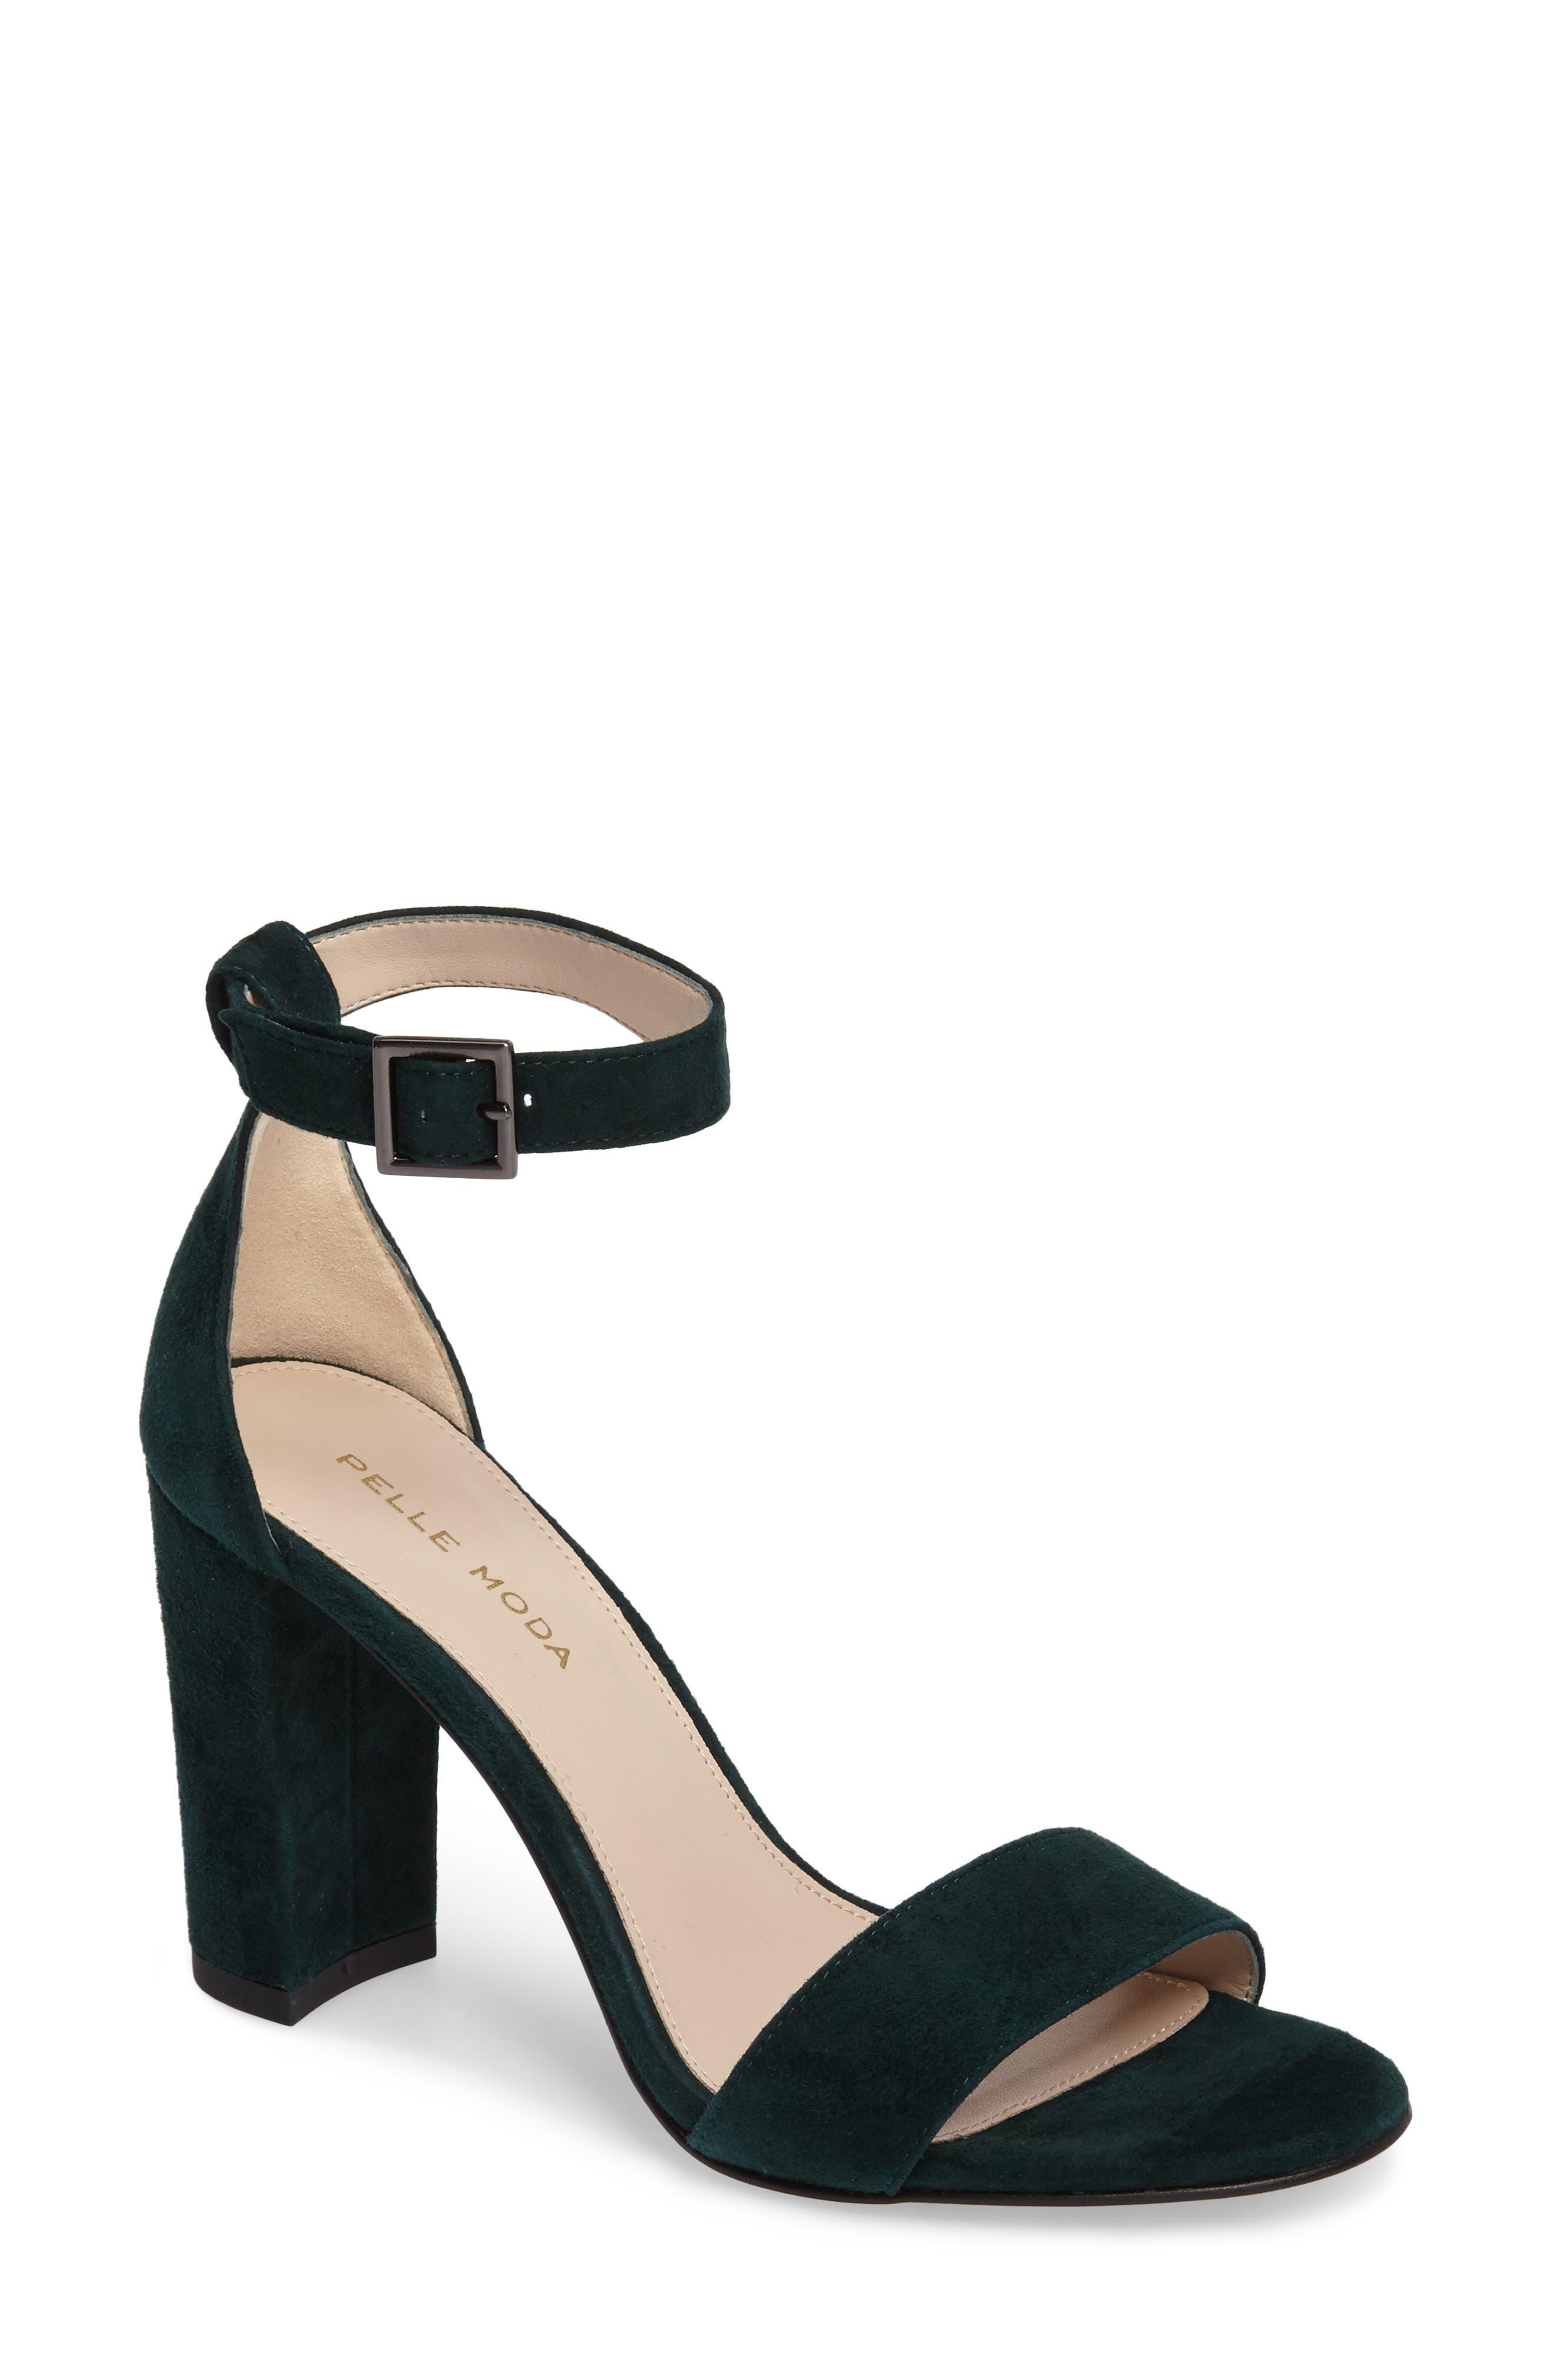 Bonnie Ankle Strap Sandal,                         Main,                         color, Forest Leather